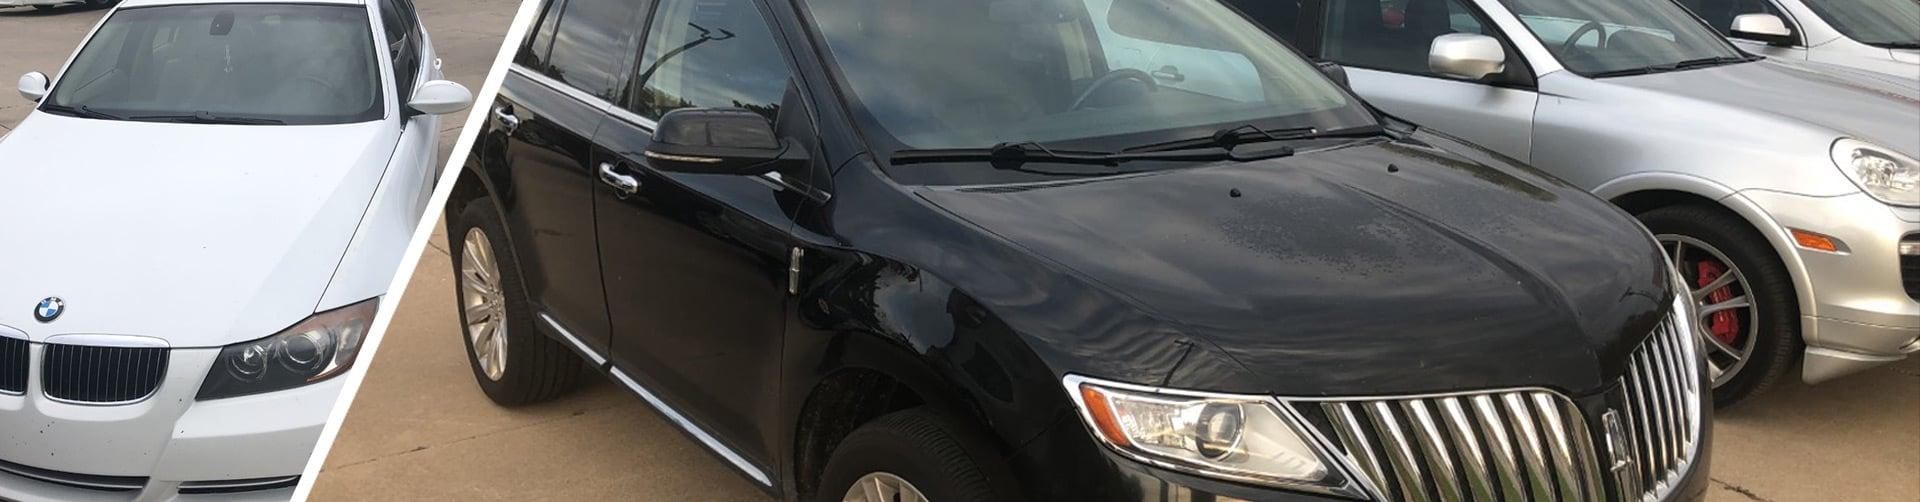 River City Motors >> River City Motors Plus Inc Car Dealer In Fort Madison Ia